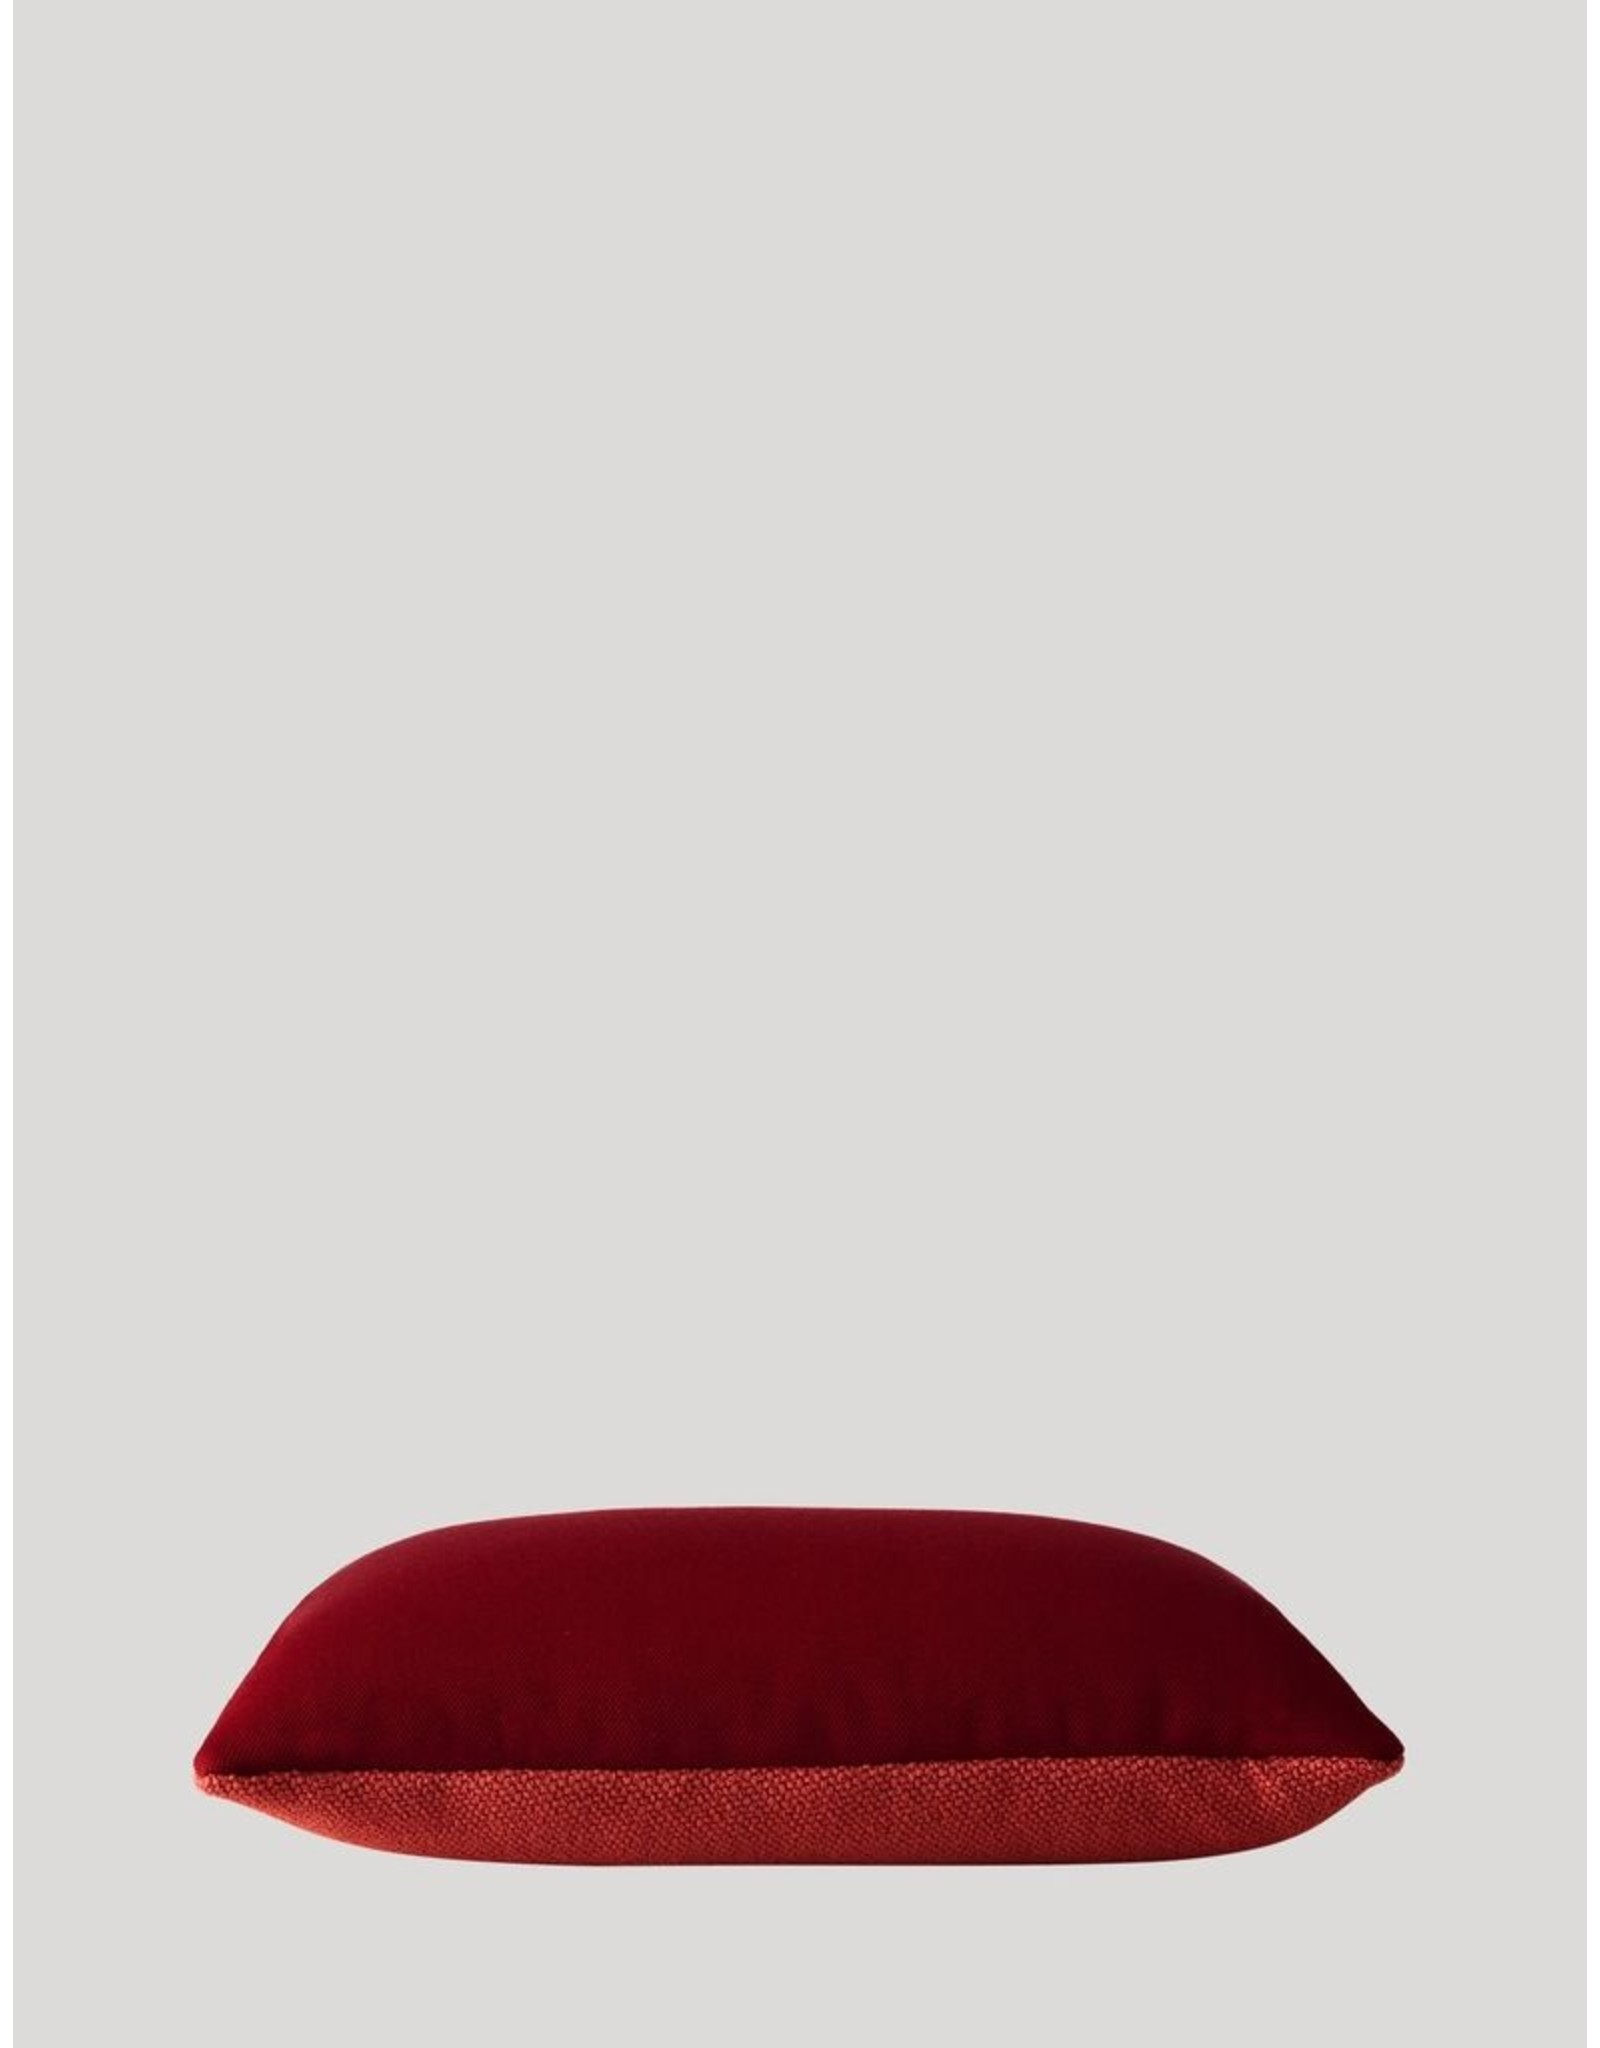 Muuto MINGLE CUSHION 50x50 RED